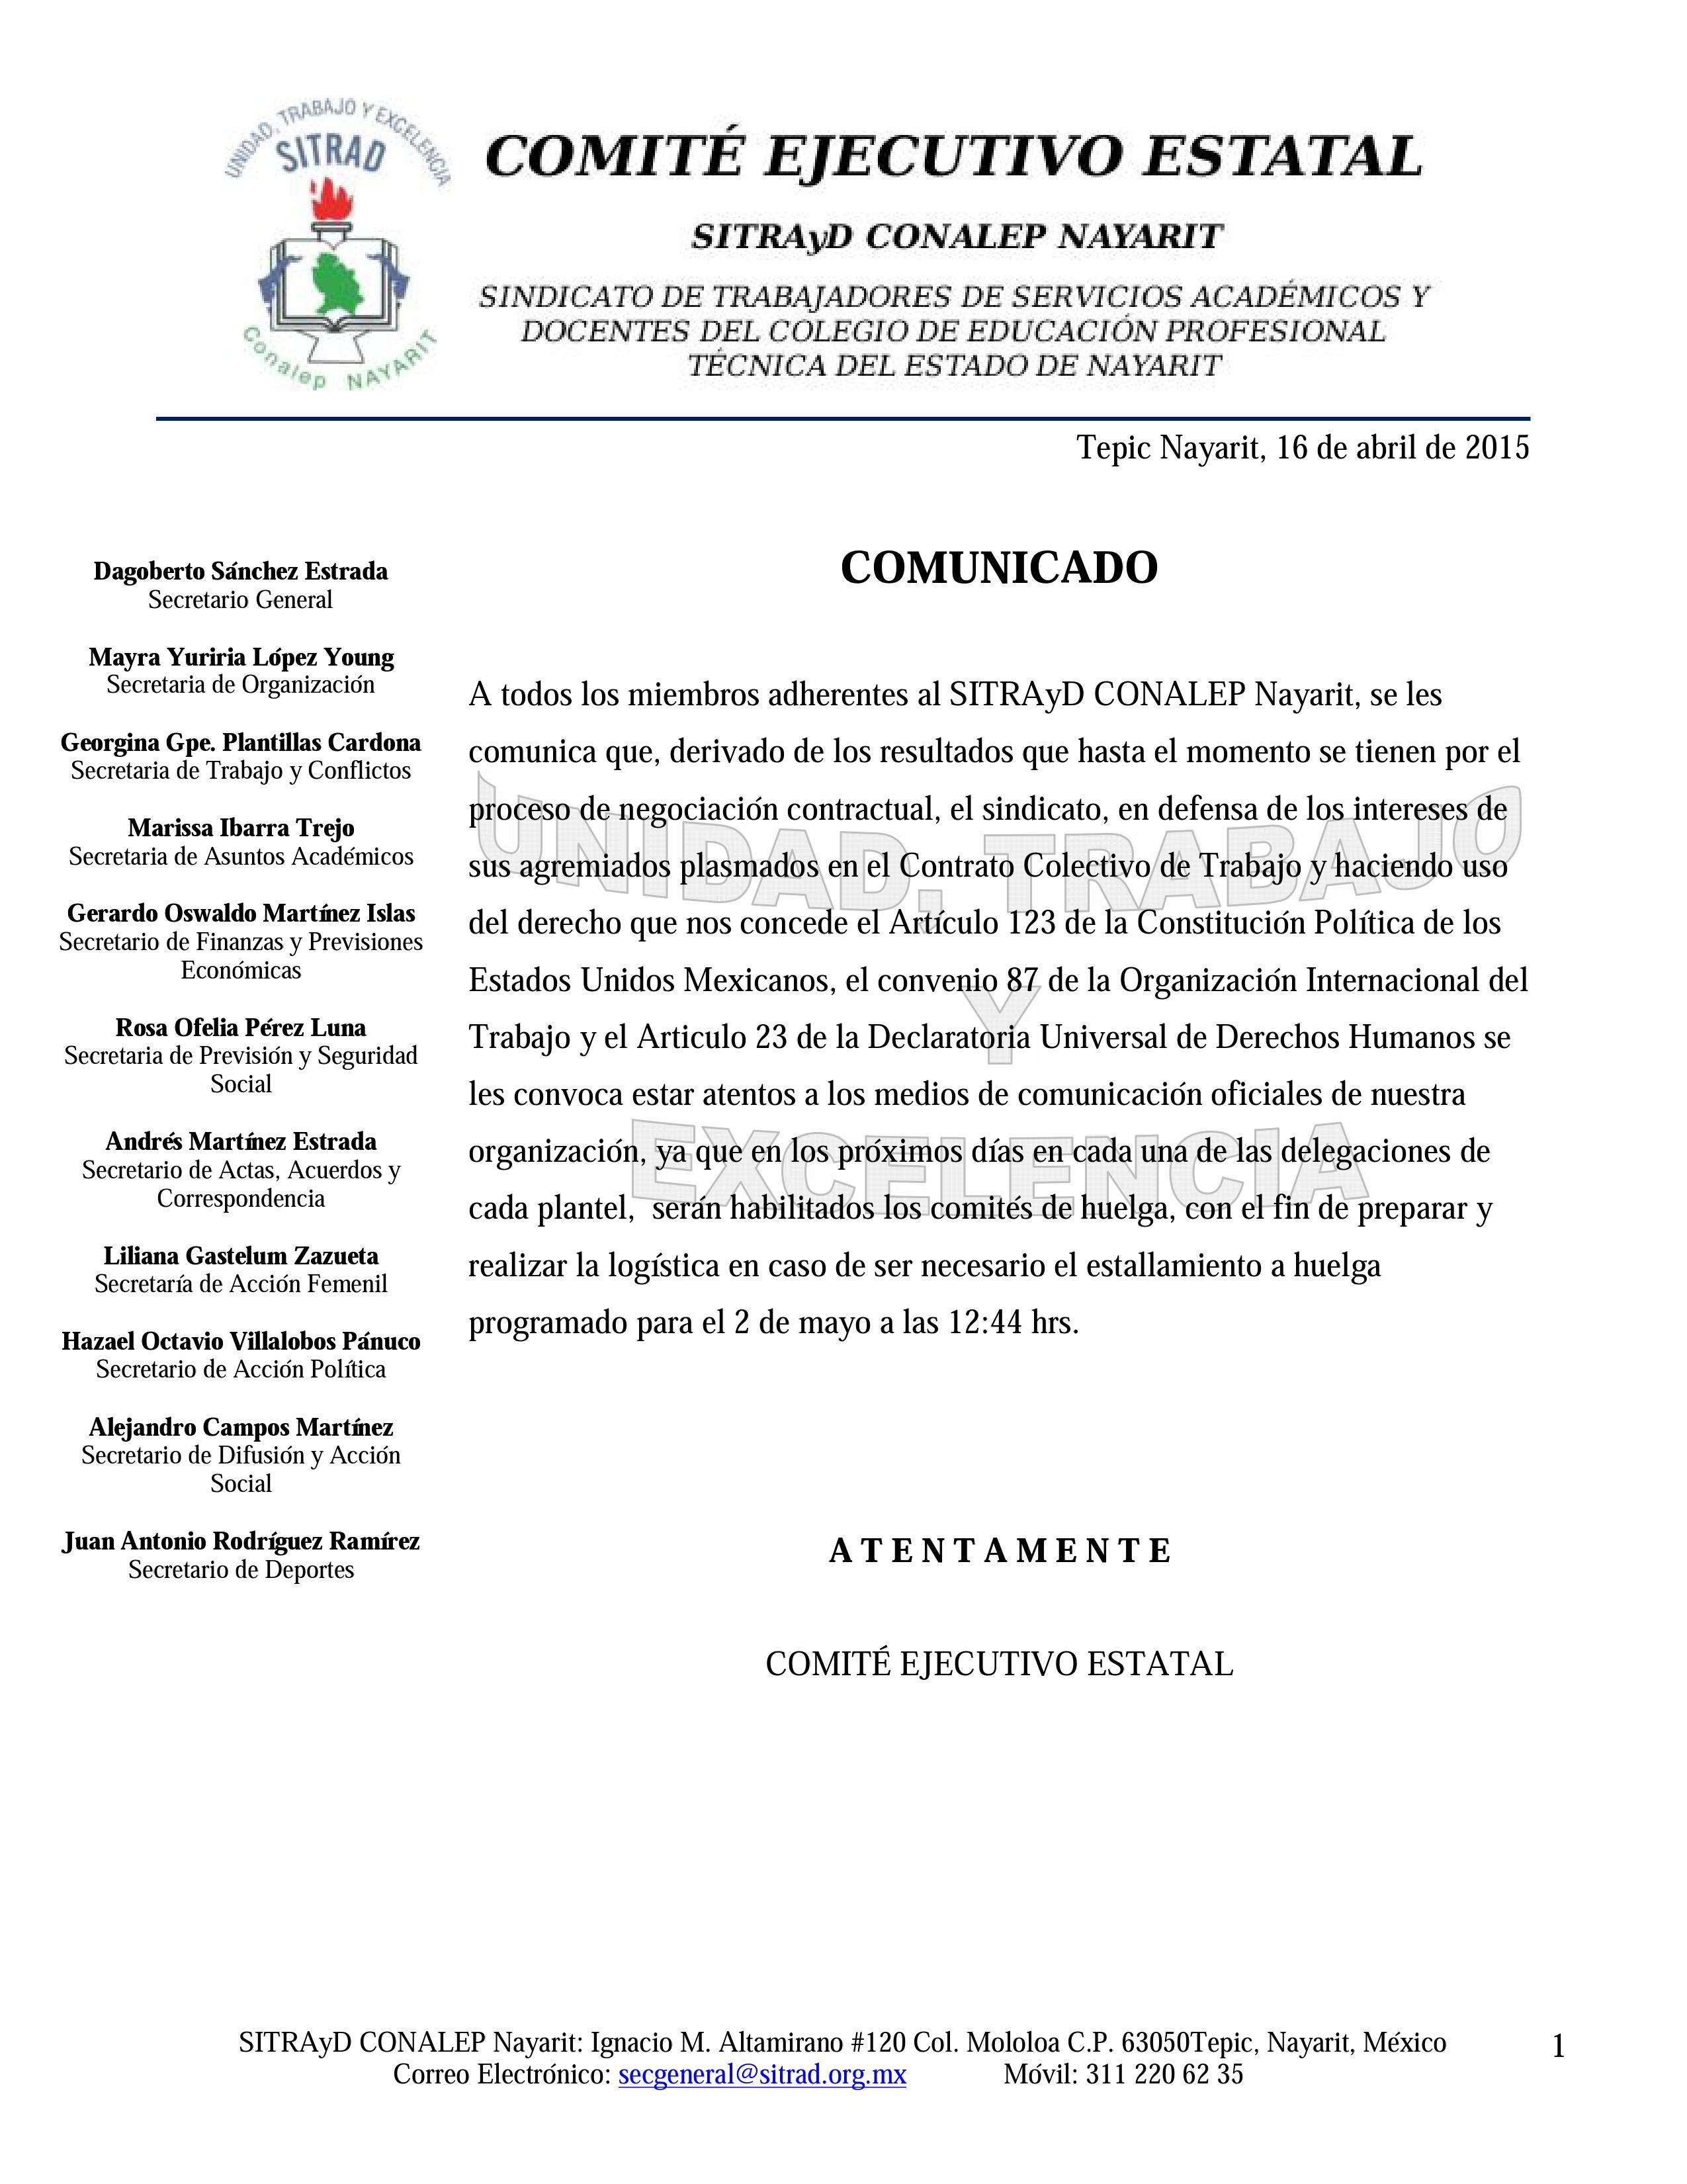 COMUNICADO HUELGA